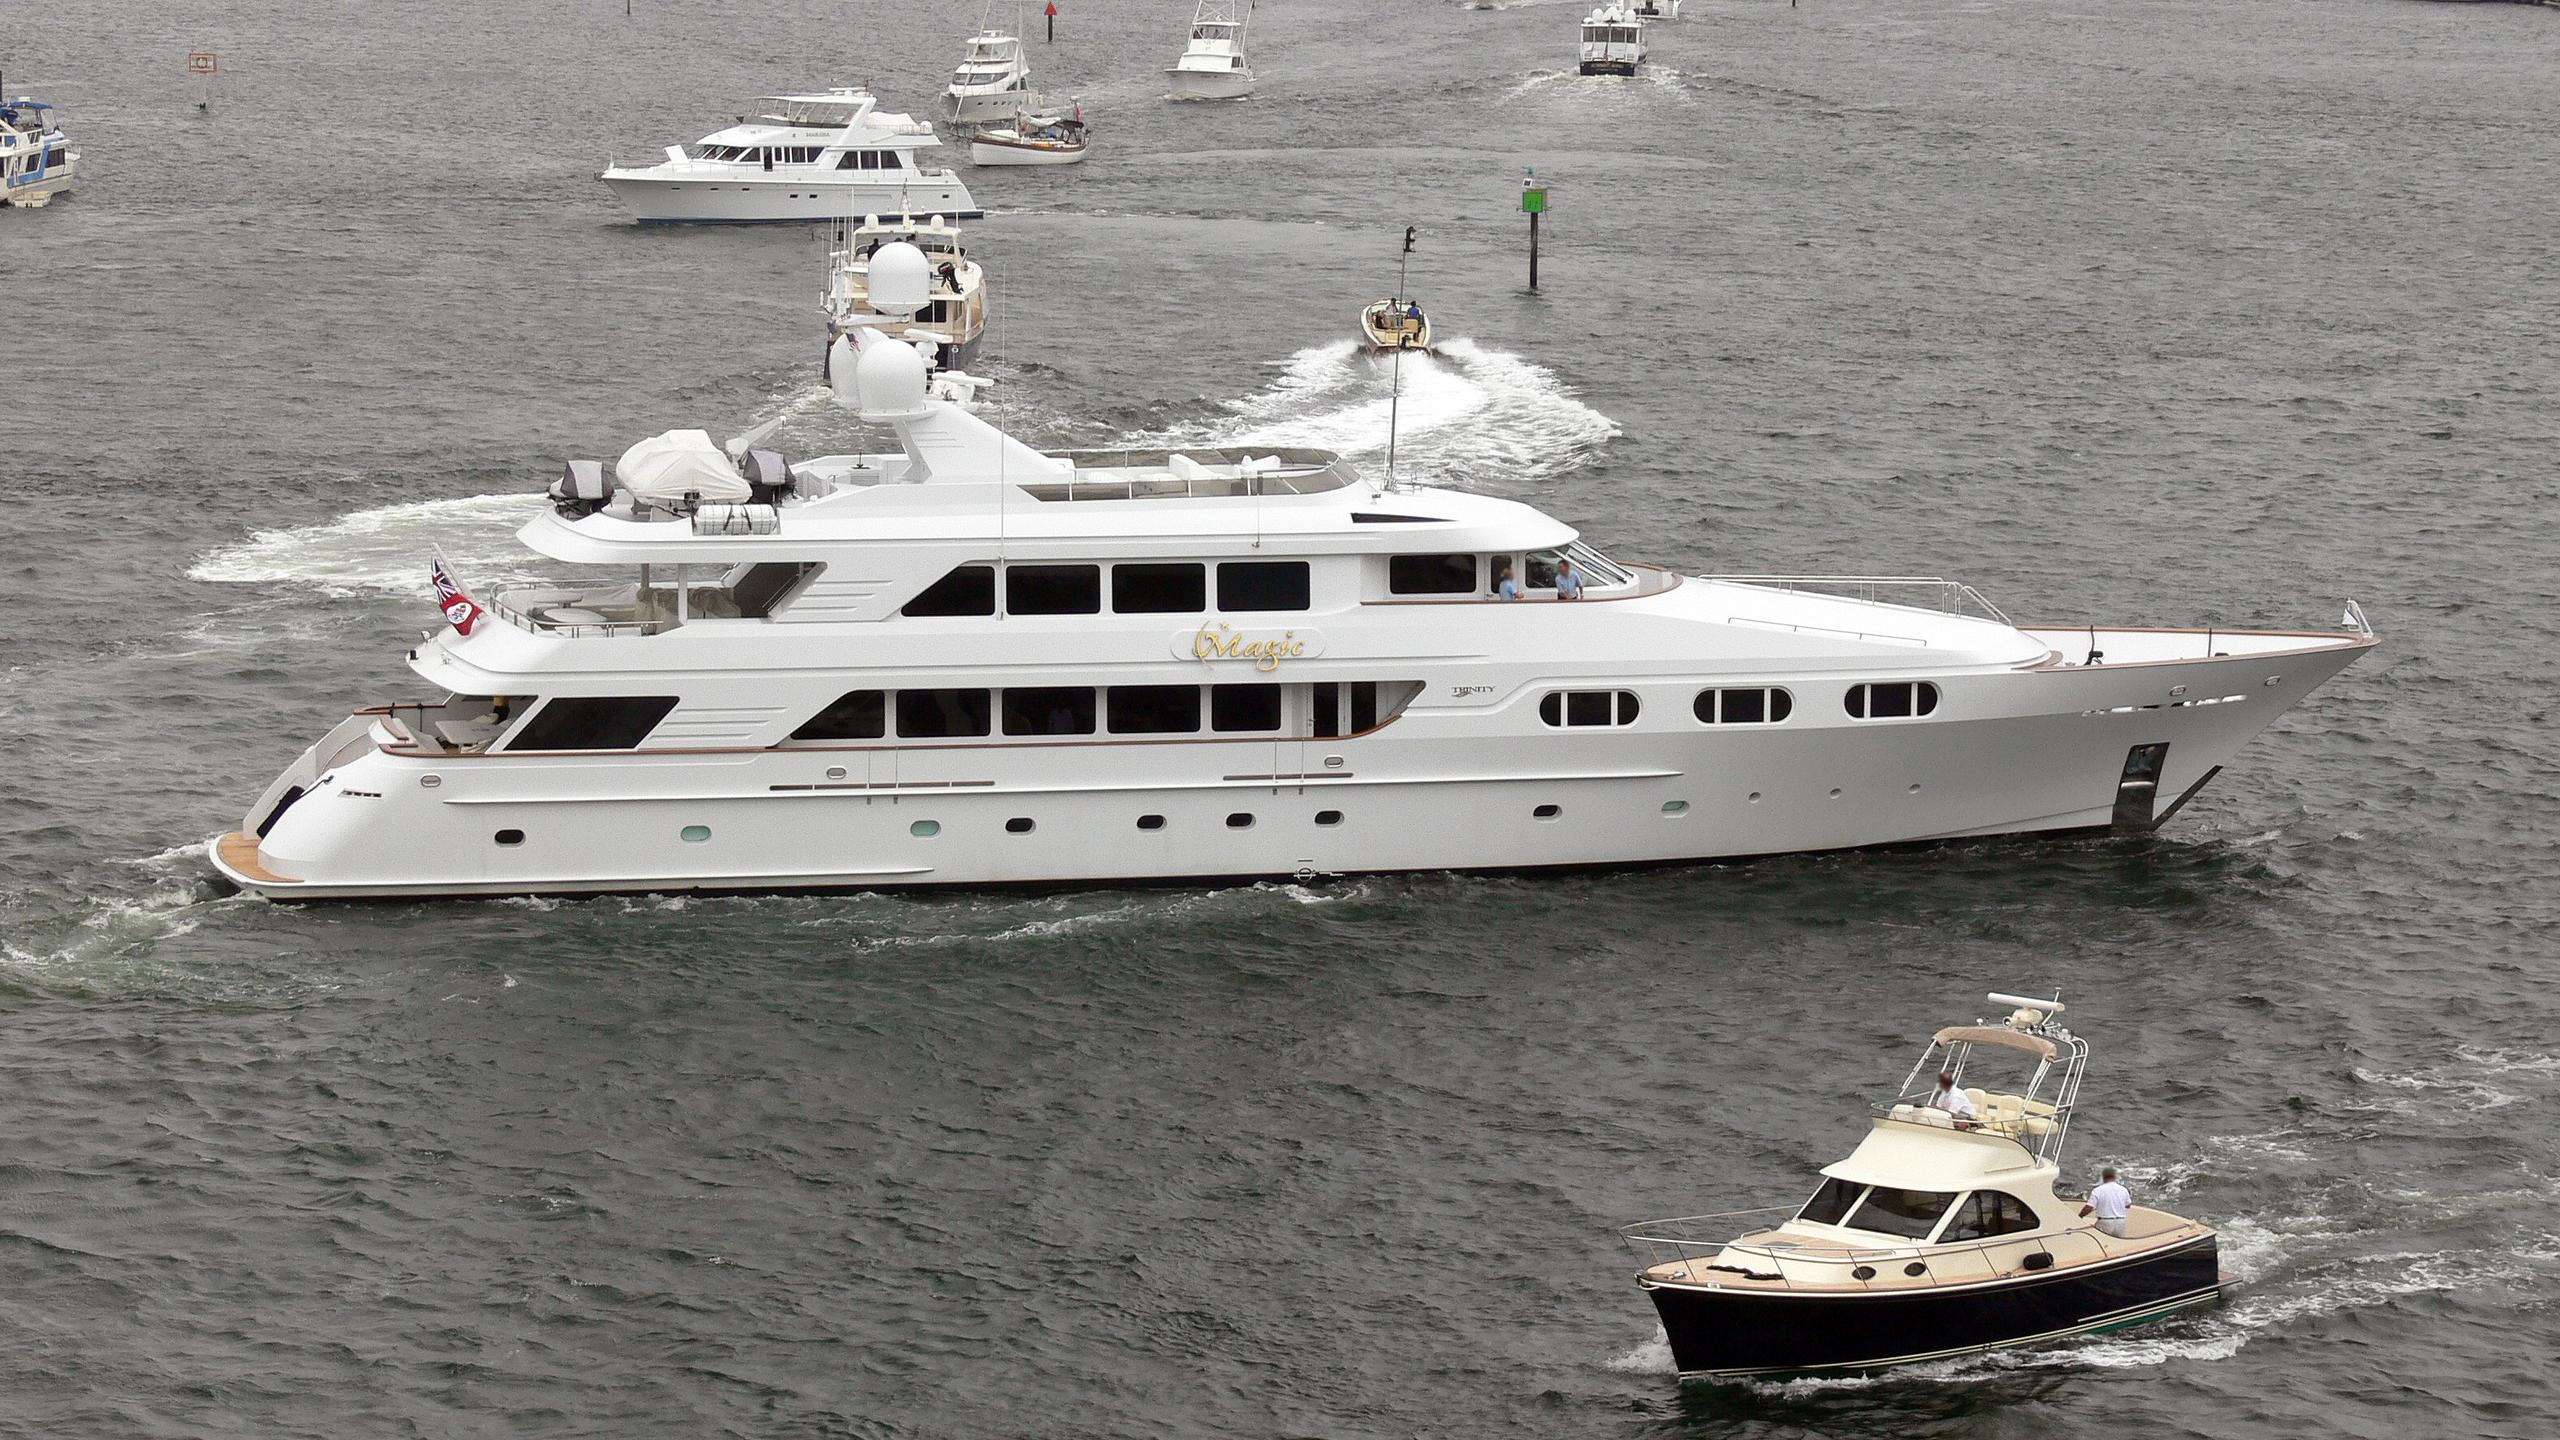 attitude-motor-yacht-trinity-1997-46m-running-profile